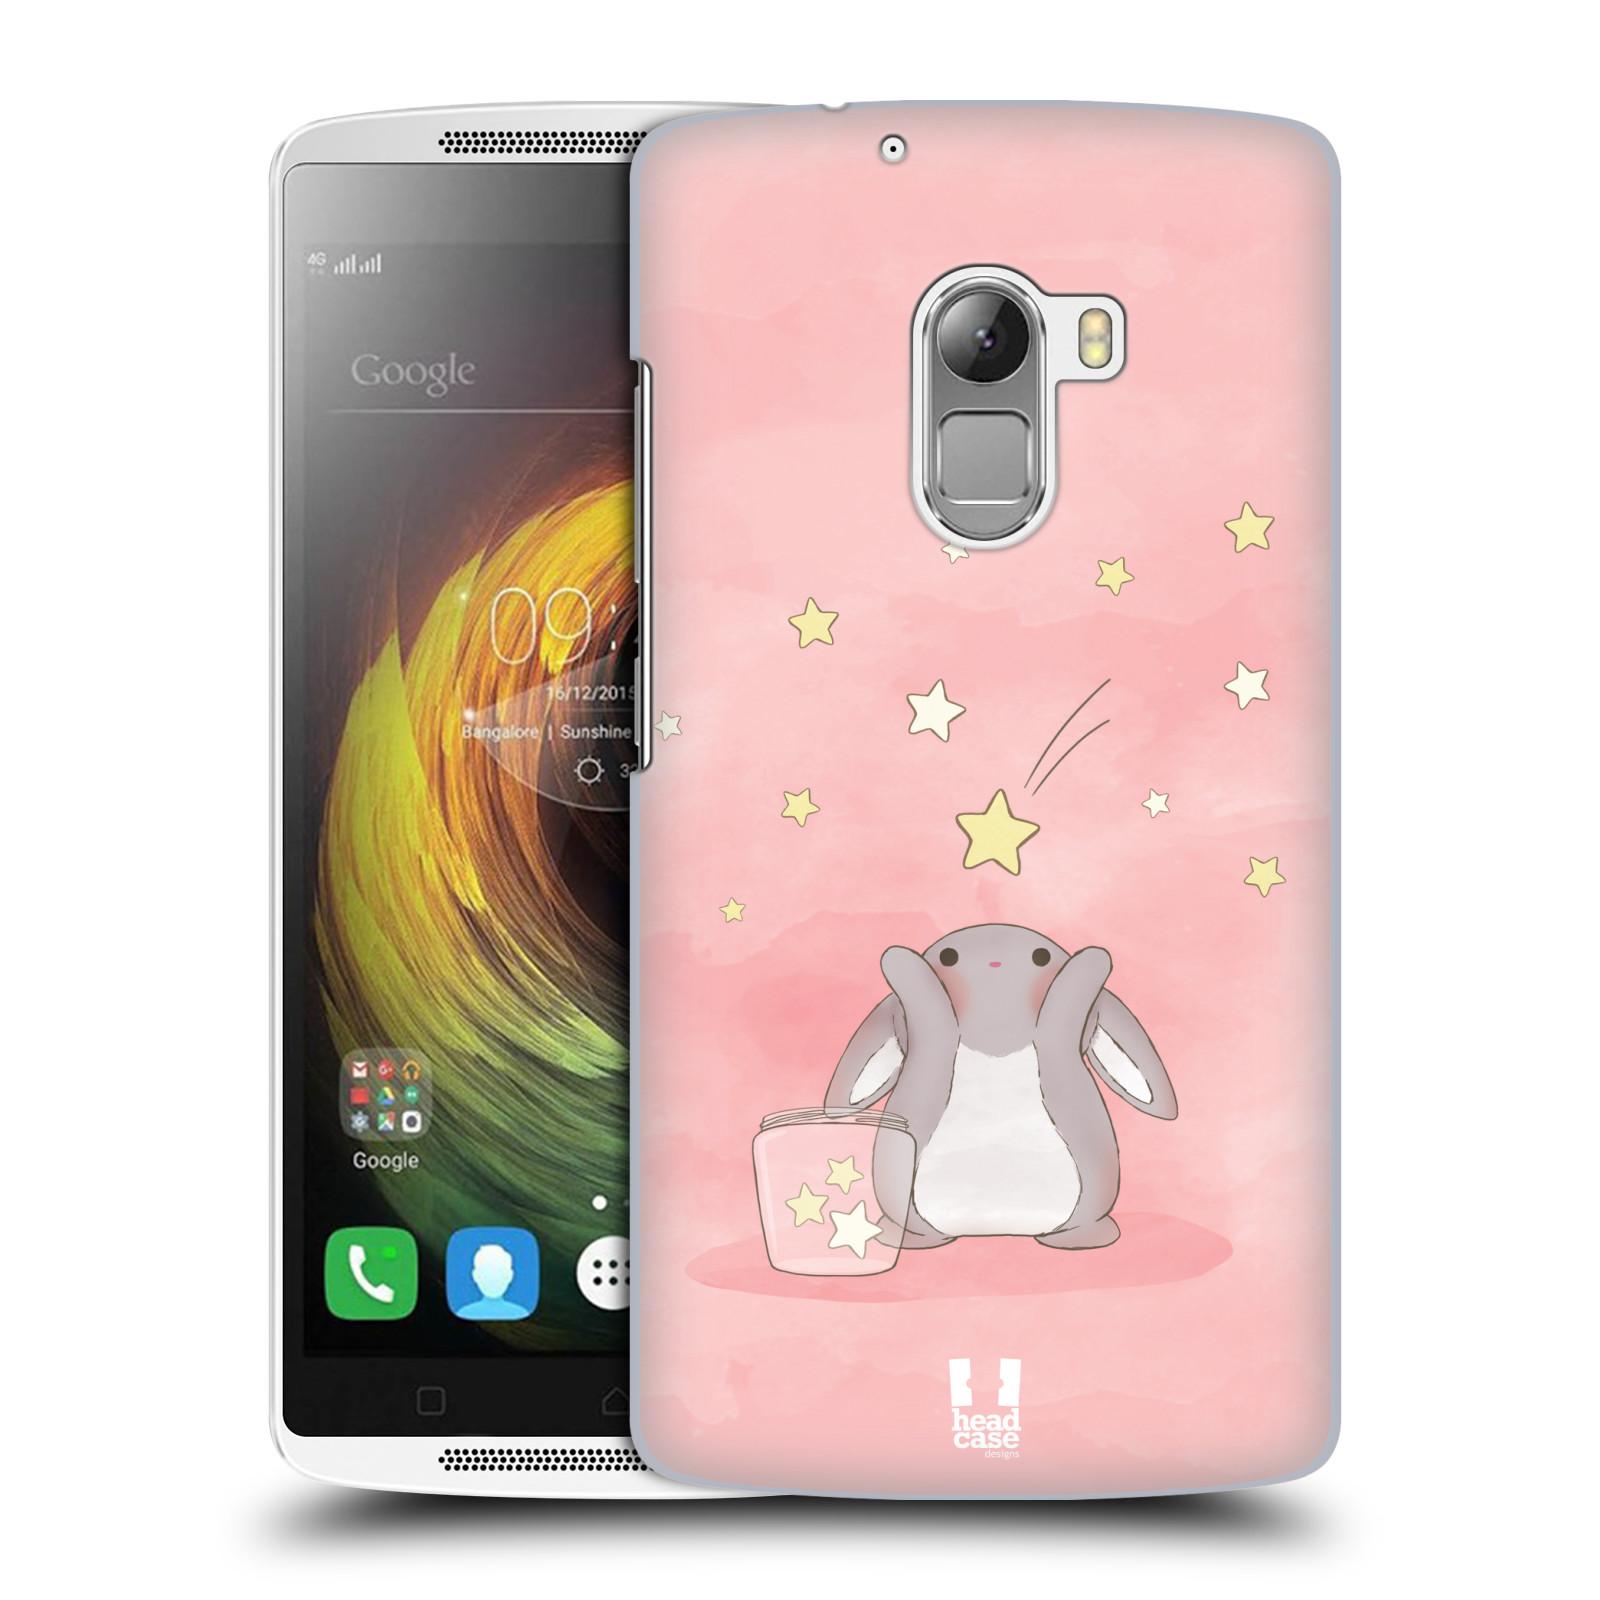 HEAD CASE pevný plastový obal na mobil LENOVO A7010 / A7010 DUAL / K4 Note / Vibe X3 lite vzor králíček a hvězdy růžová